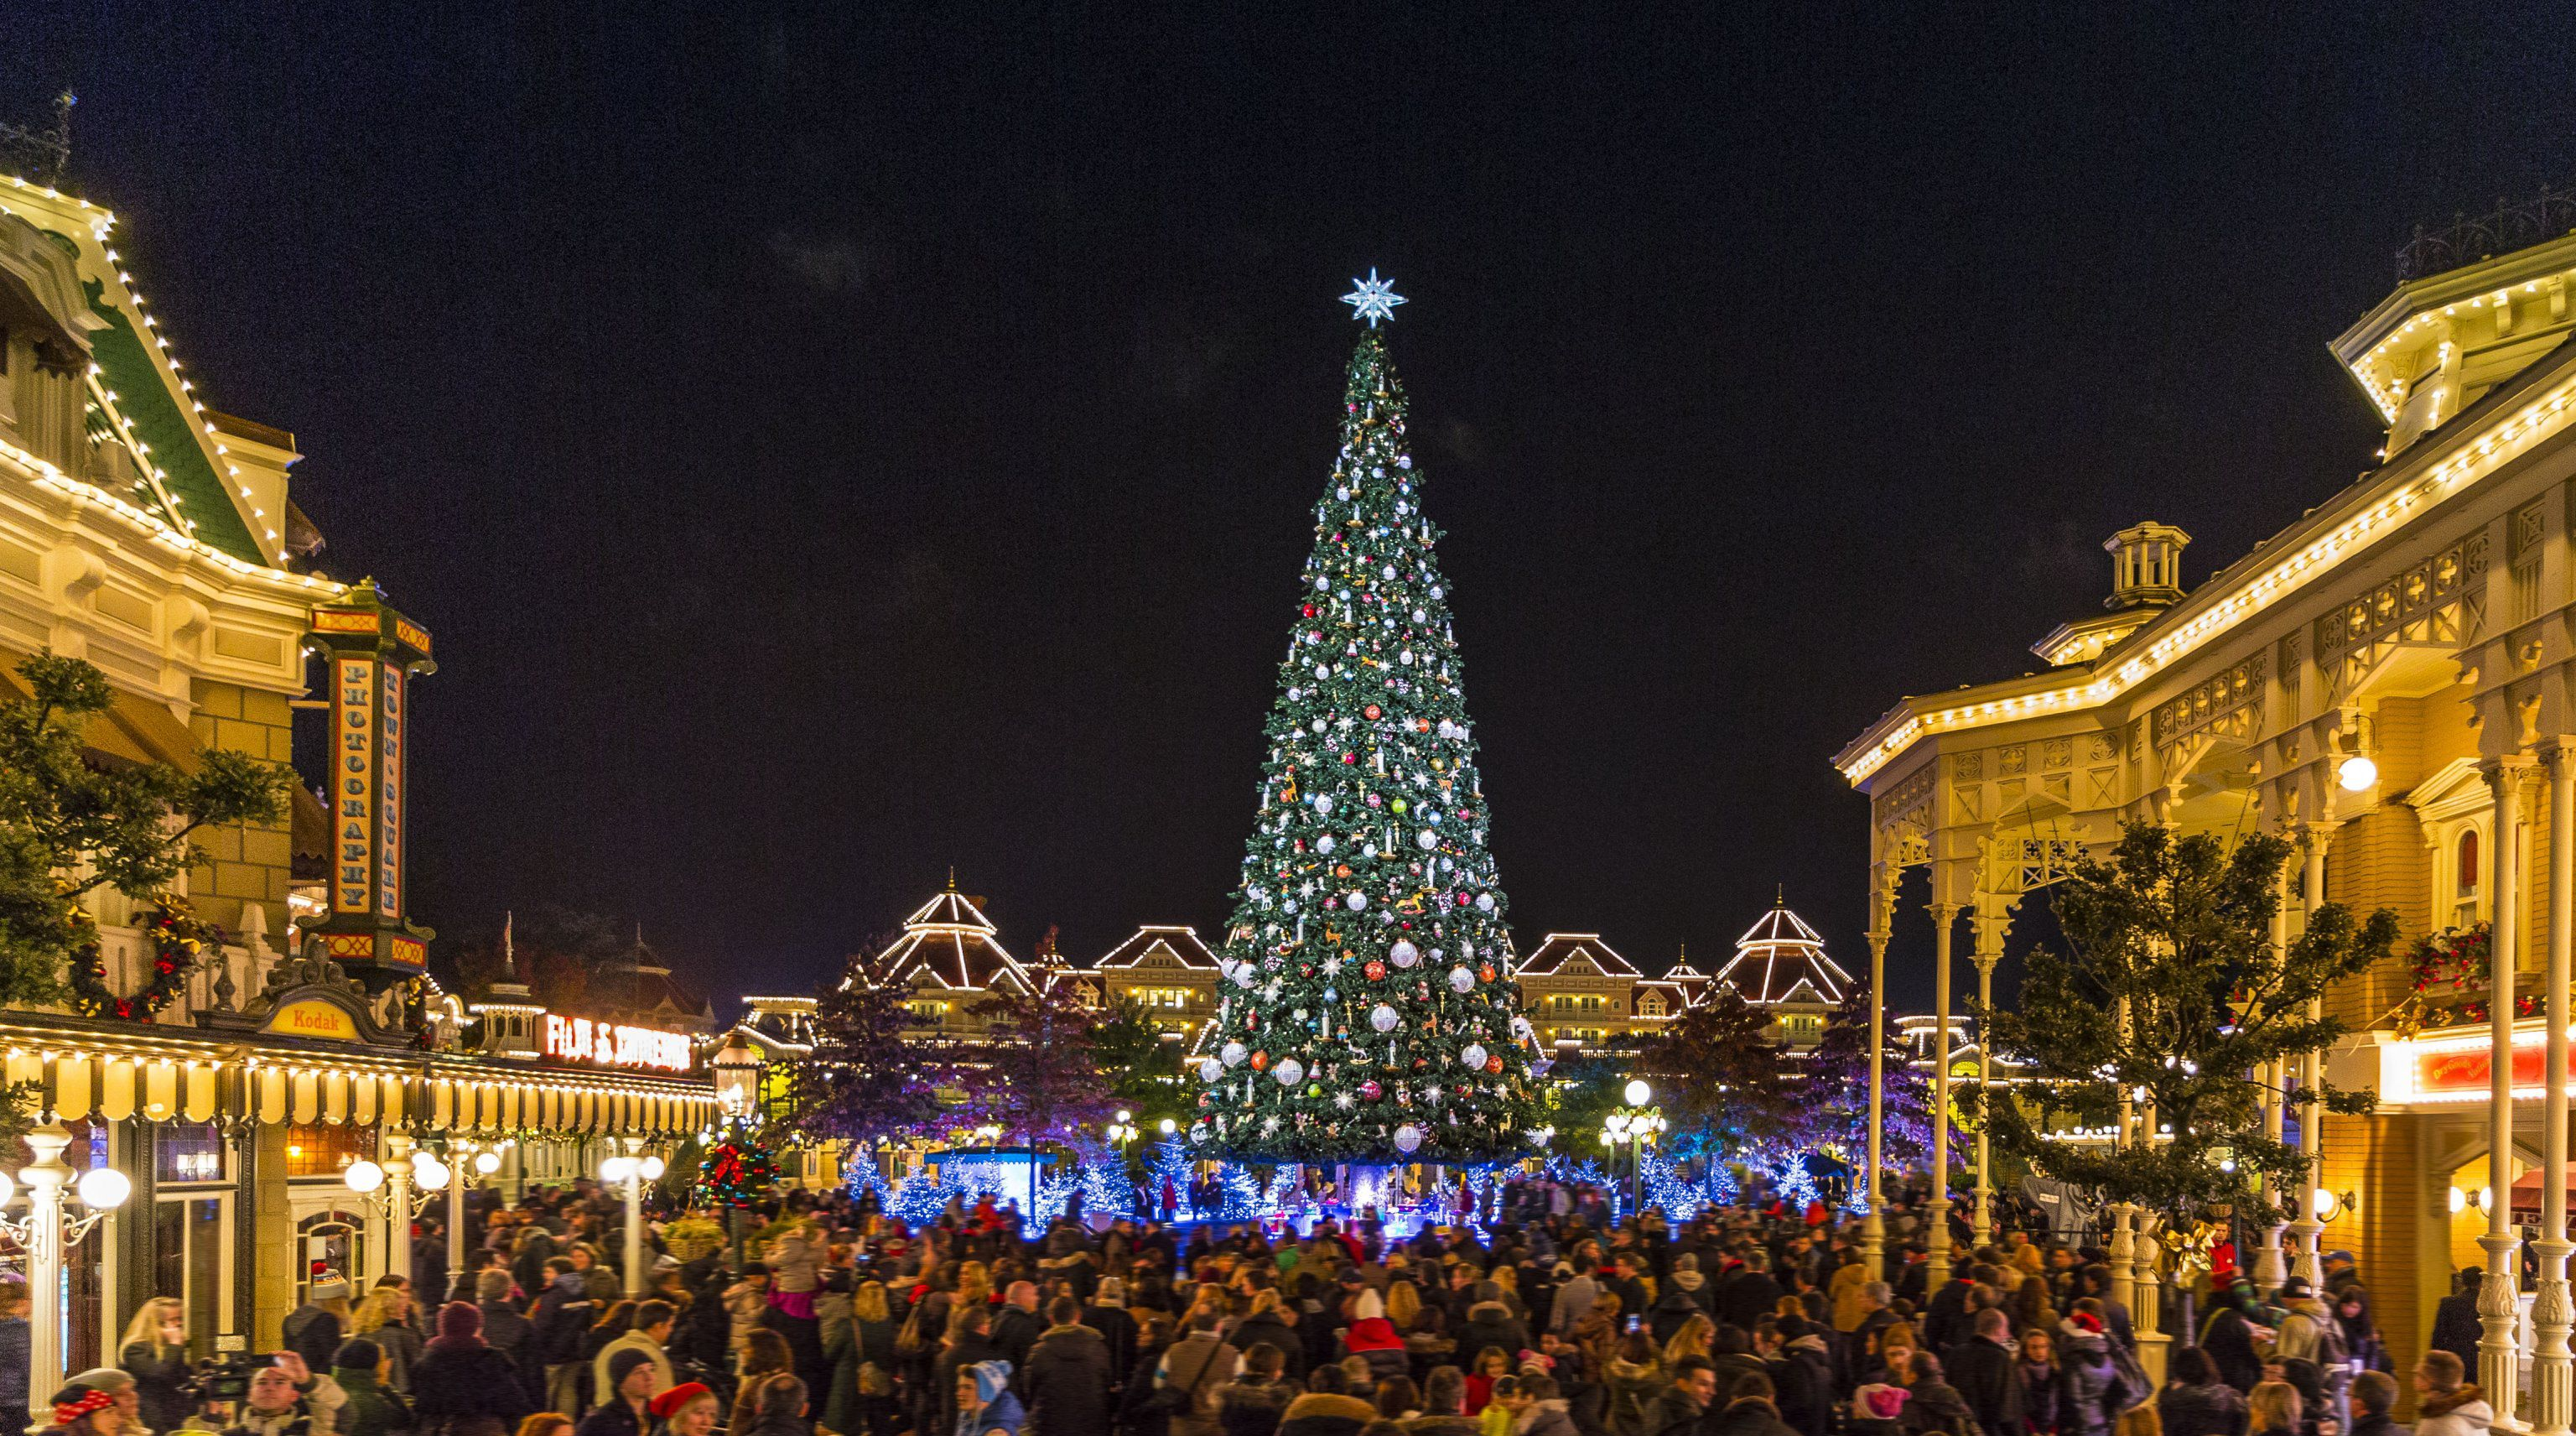 Christmas At Disneyland.10 Reasons To Visit Disneyland Paris This Christmas